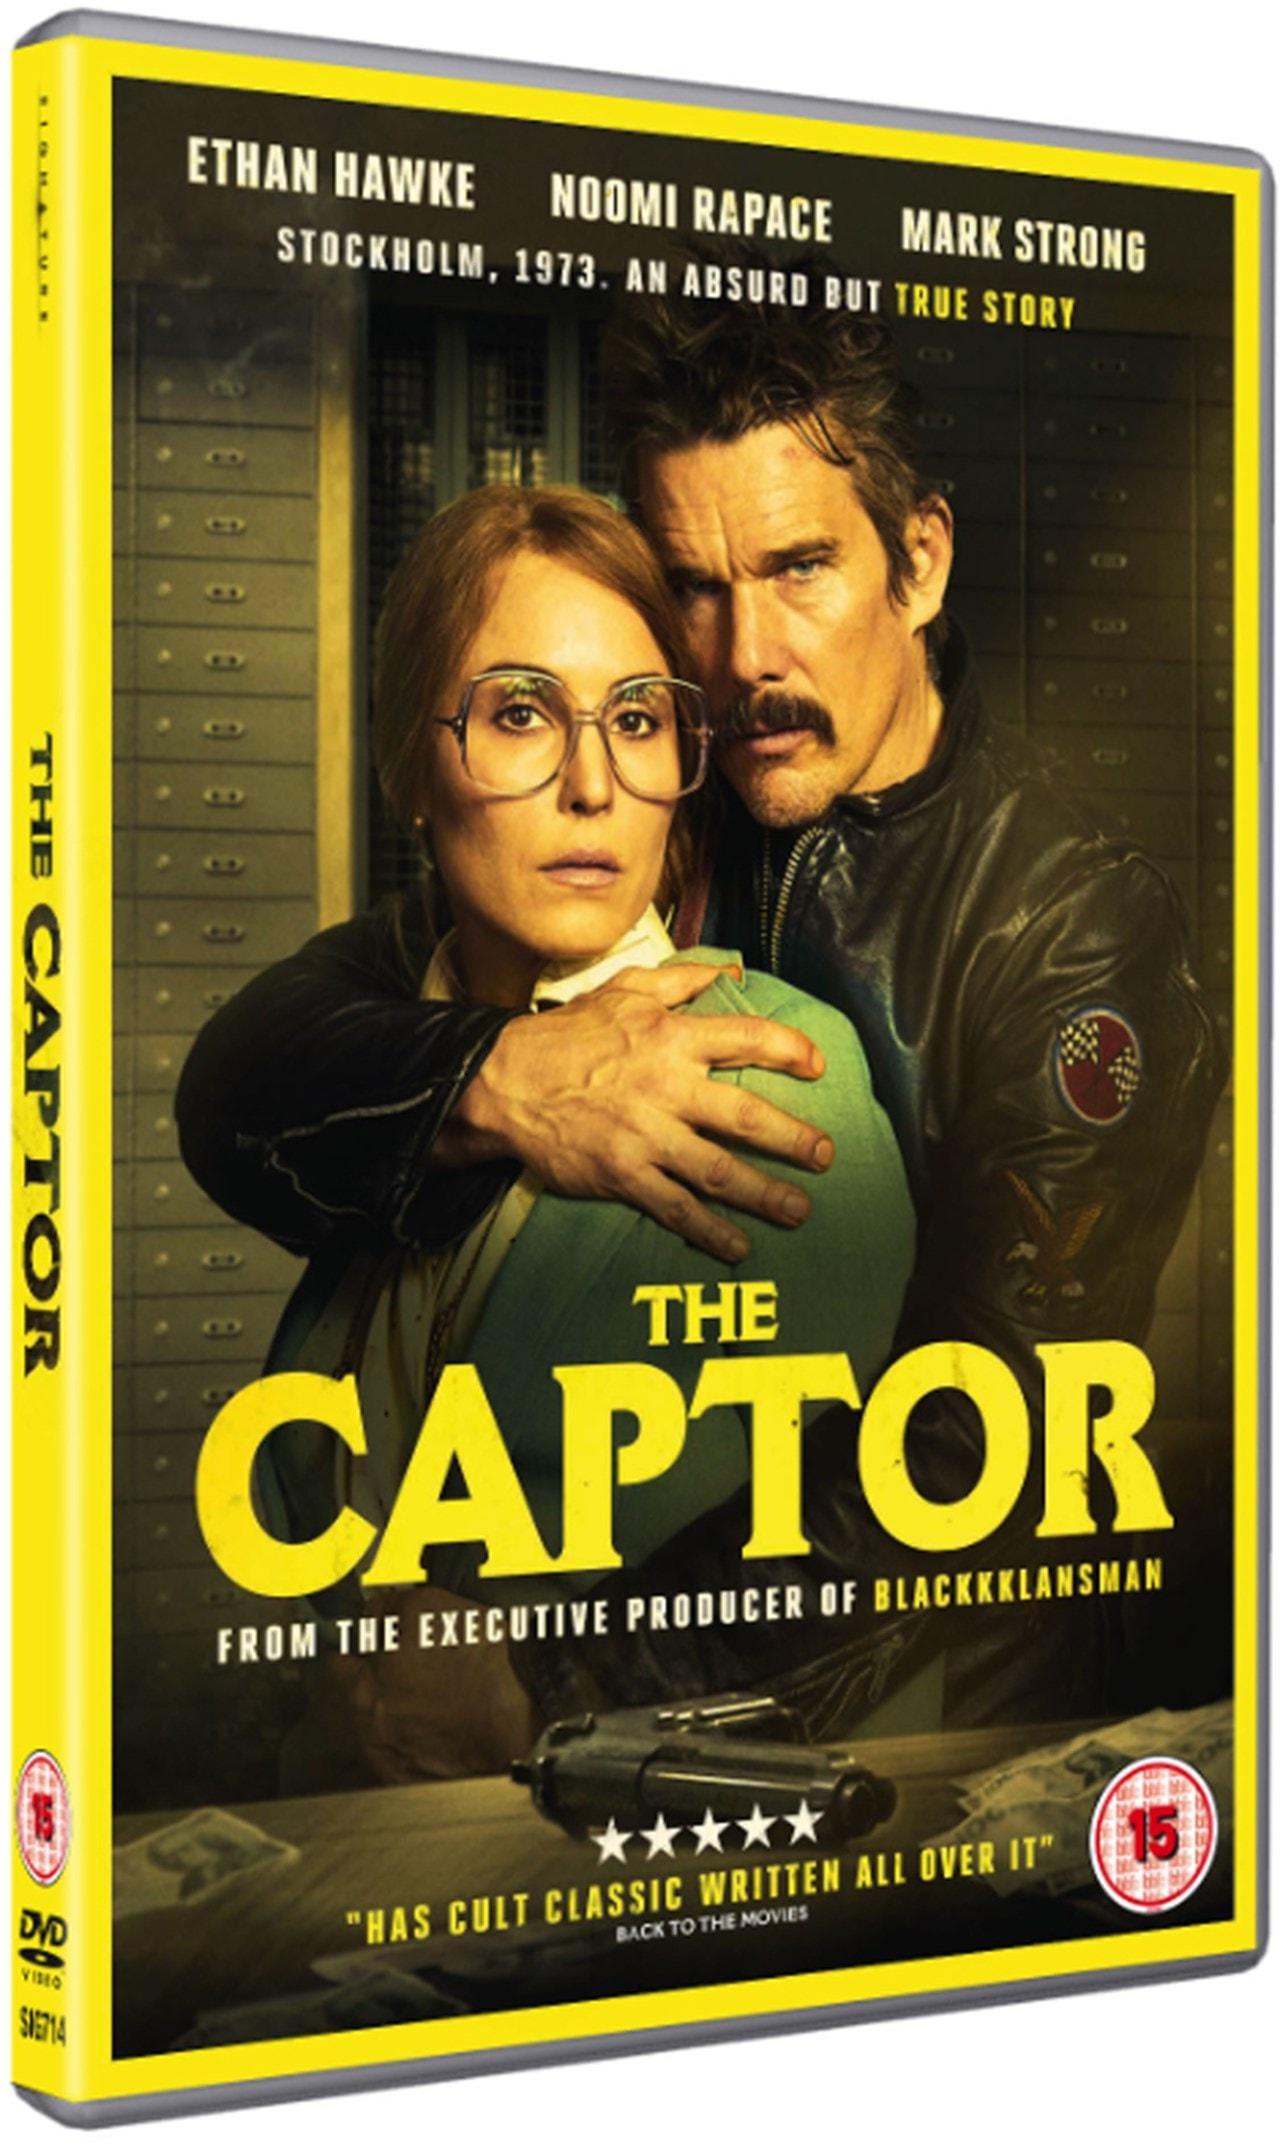 The Captor - 2